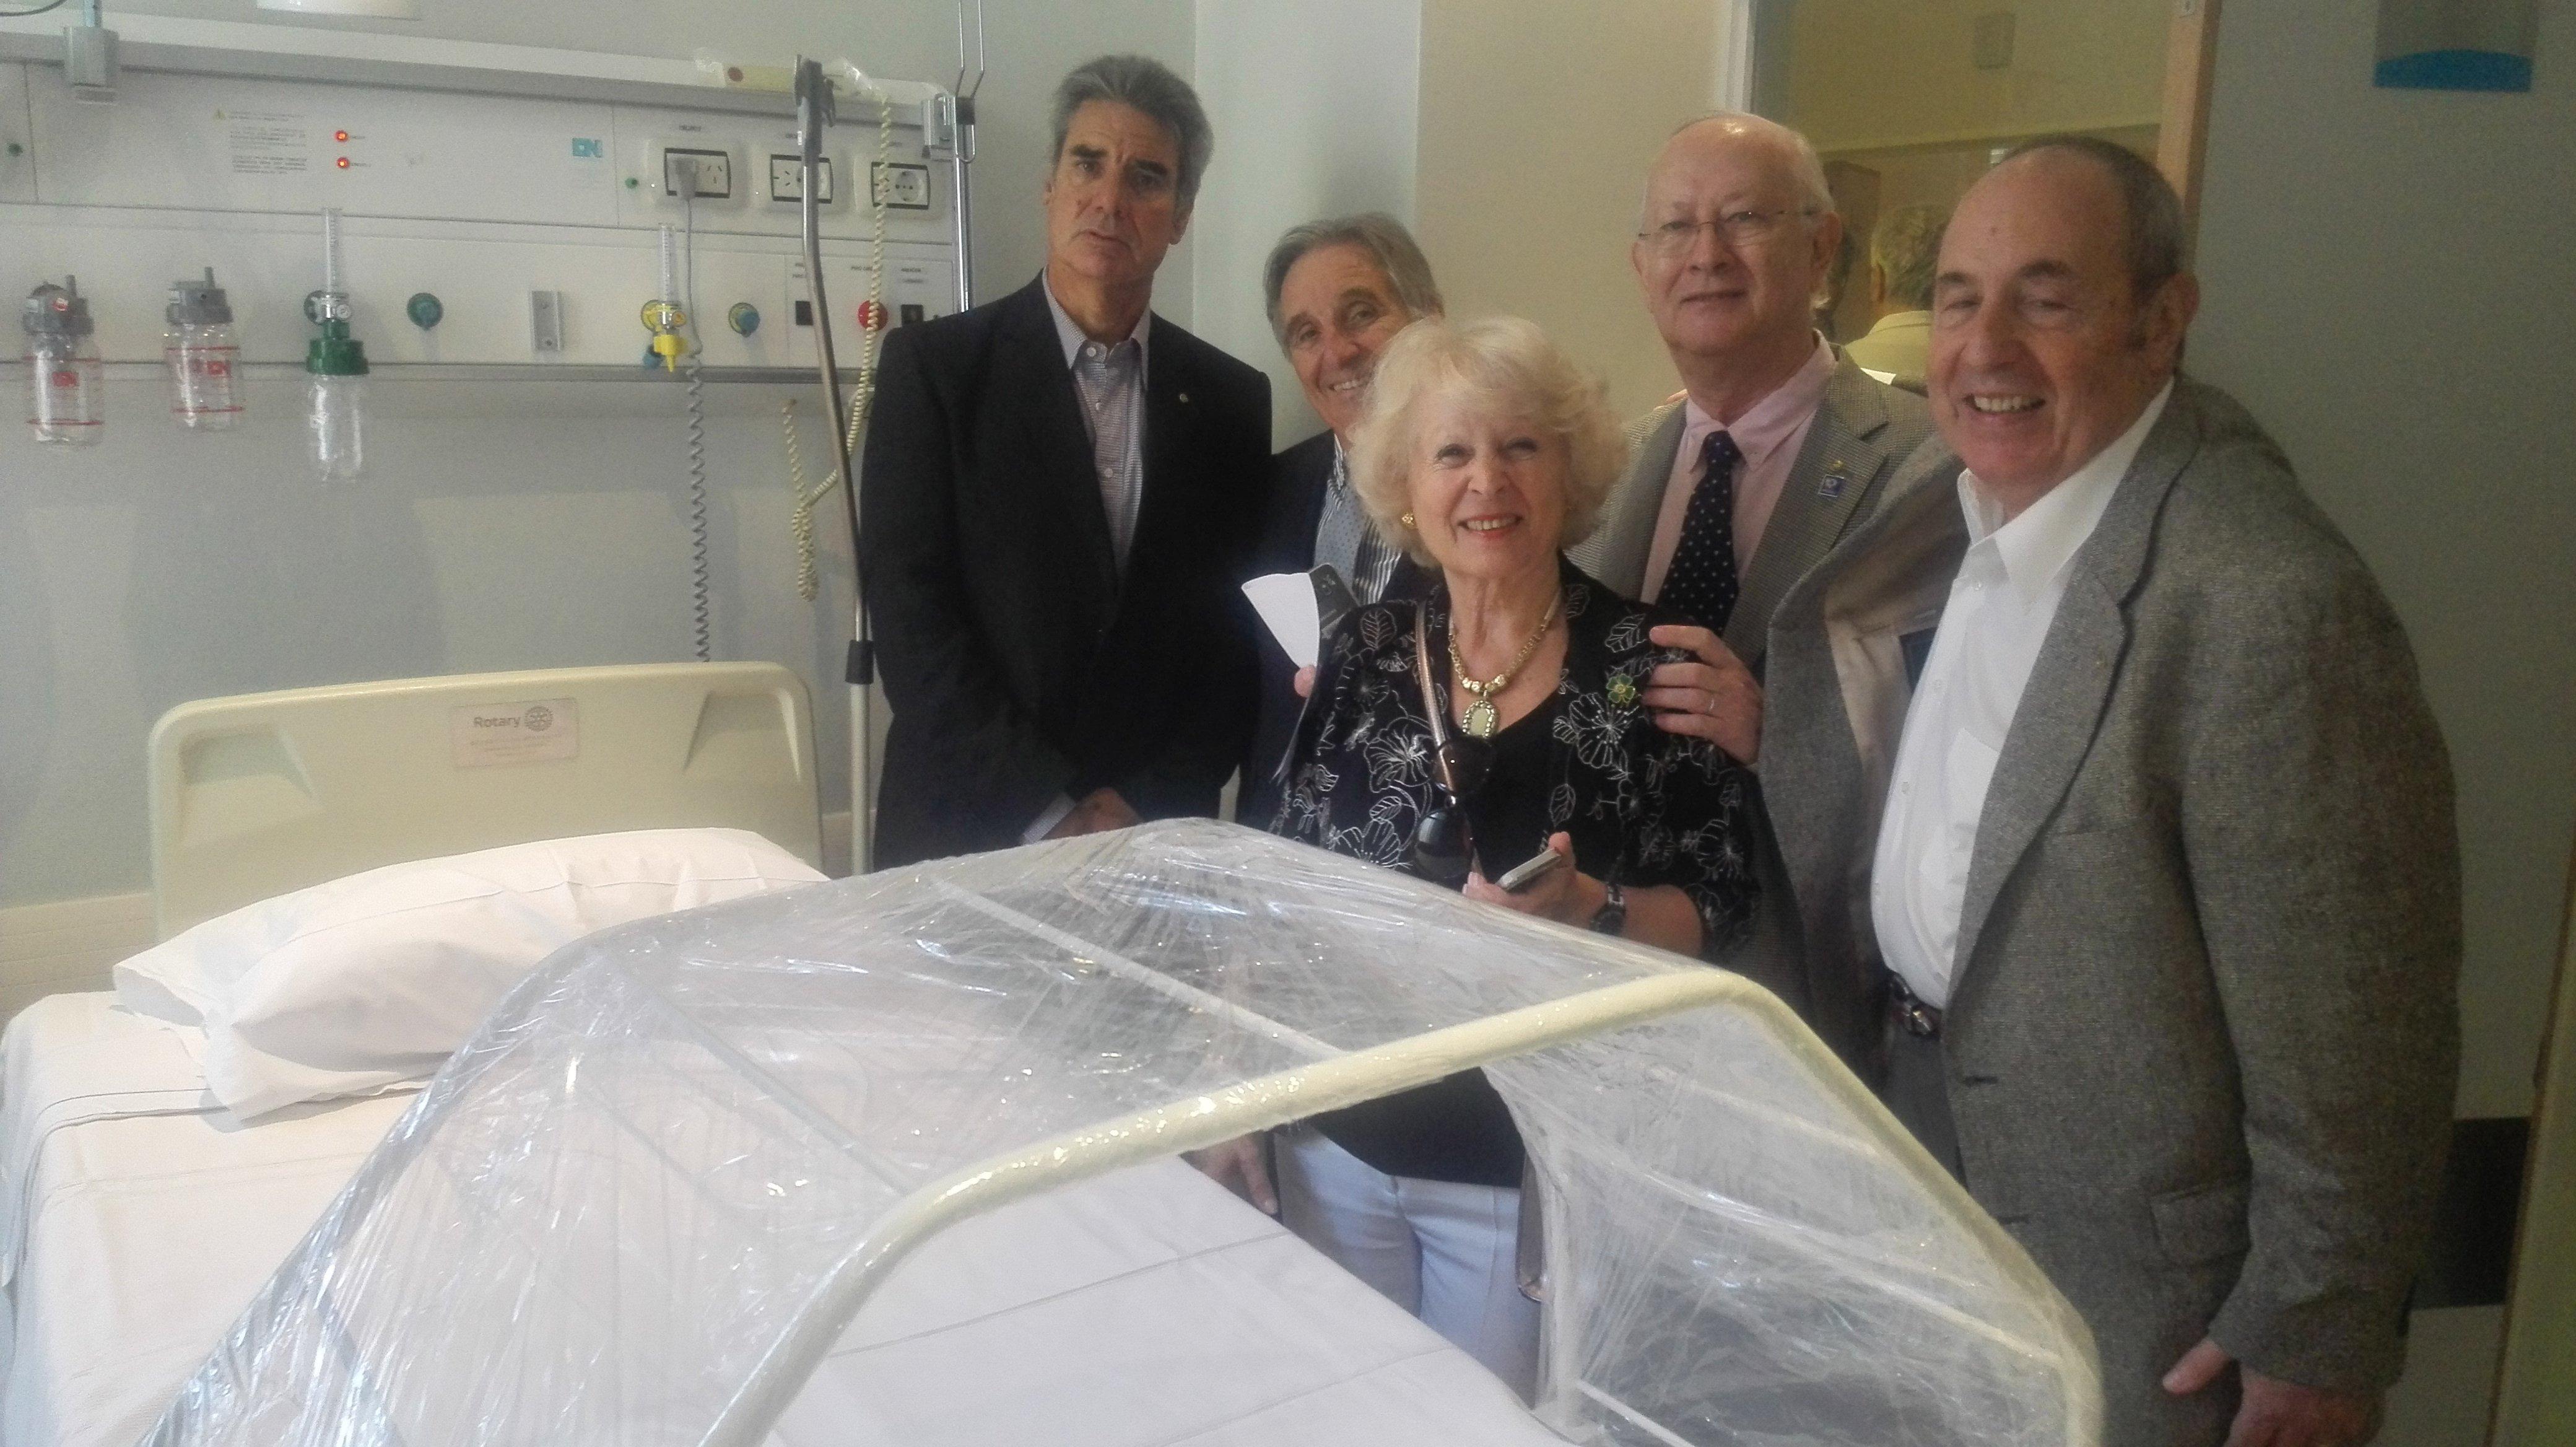 Don lits Hôpital Pirovano RC Bordeaux photo groupe